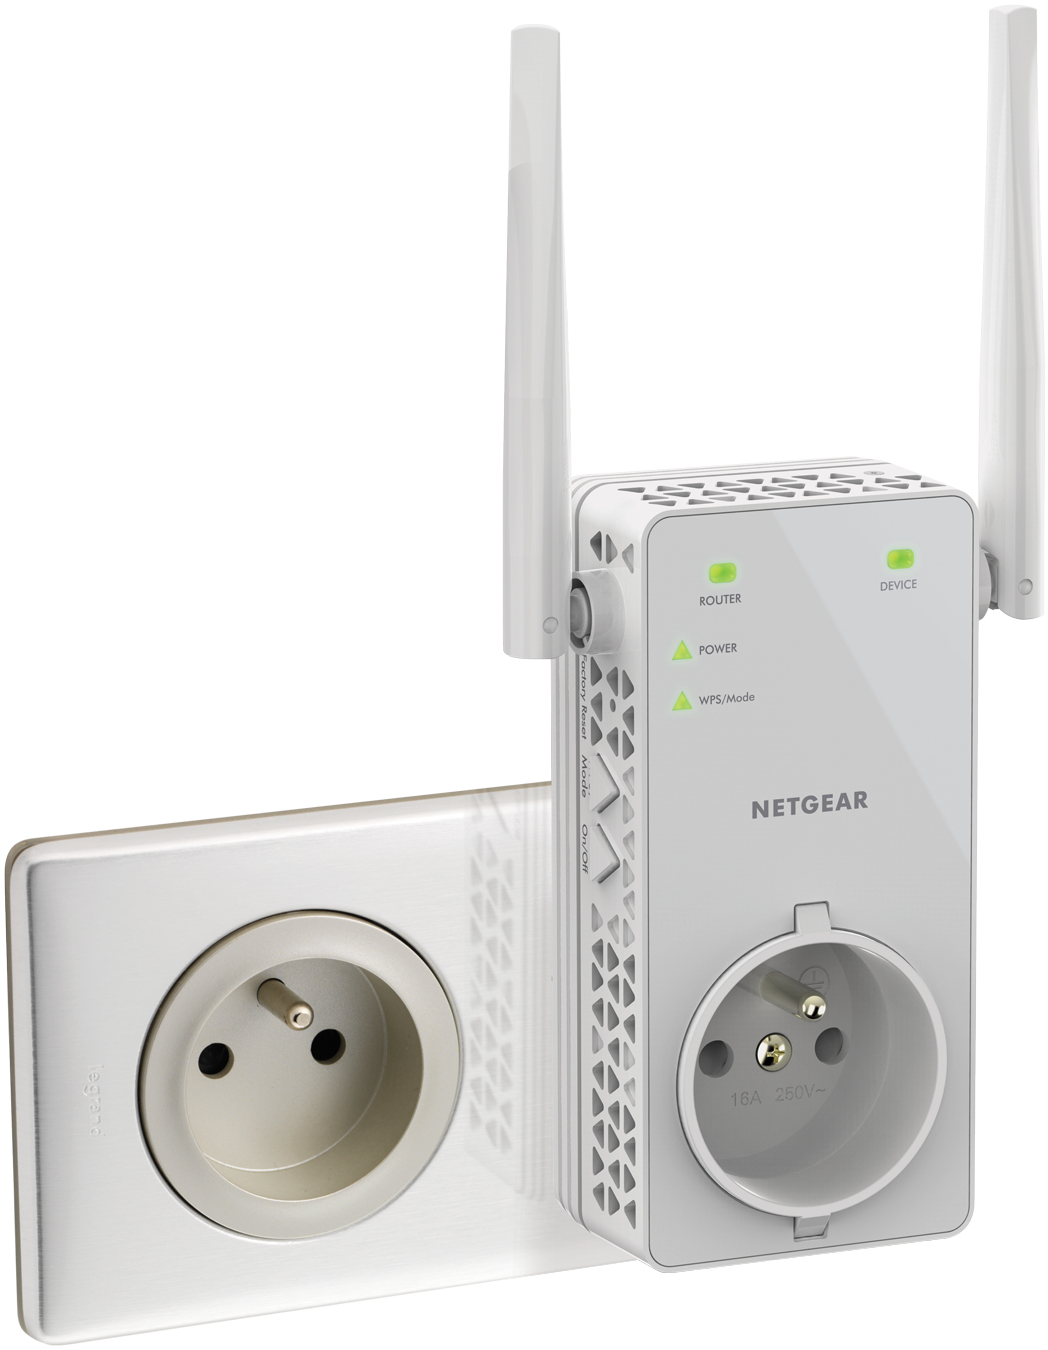 EX6130 Wi-Fi range extender (802.11a/b/g/n/ac, dual band)